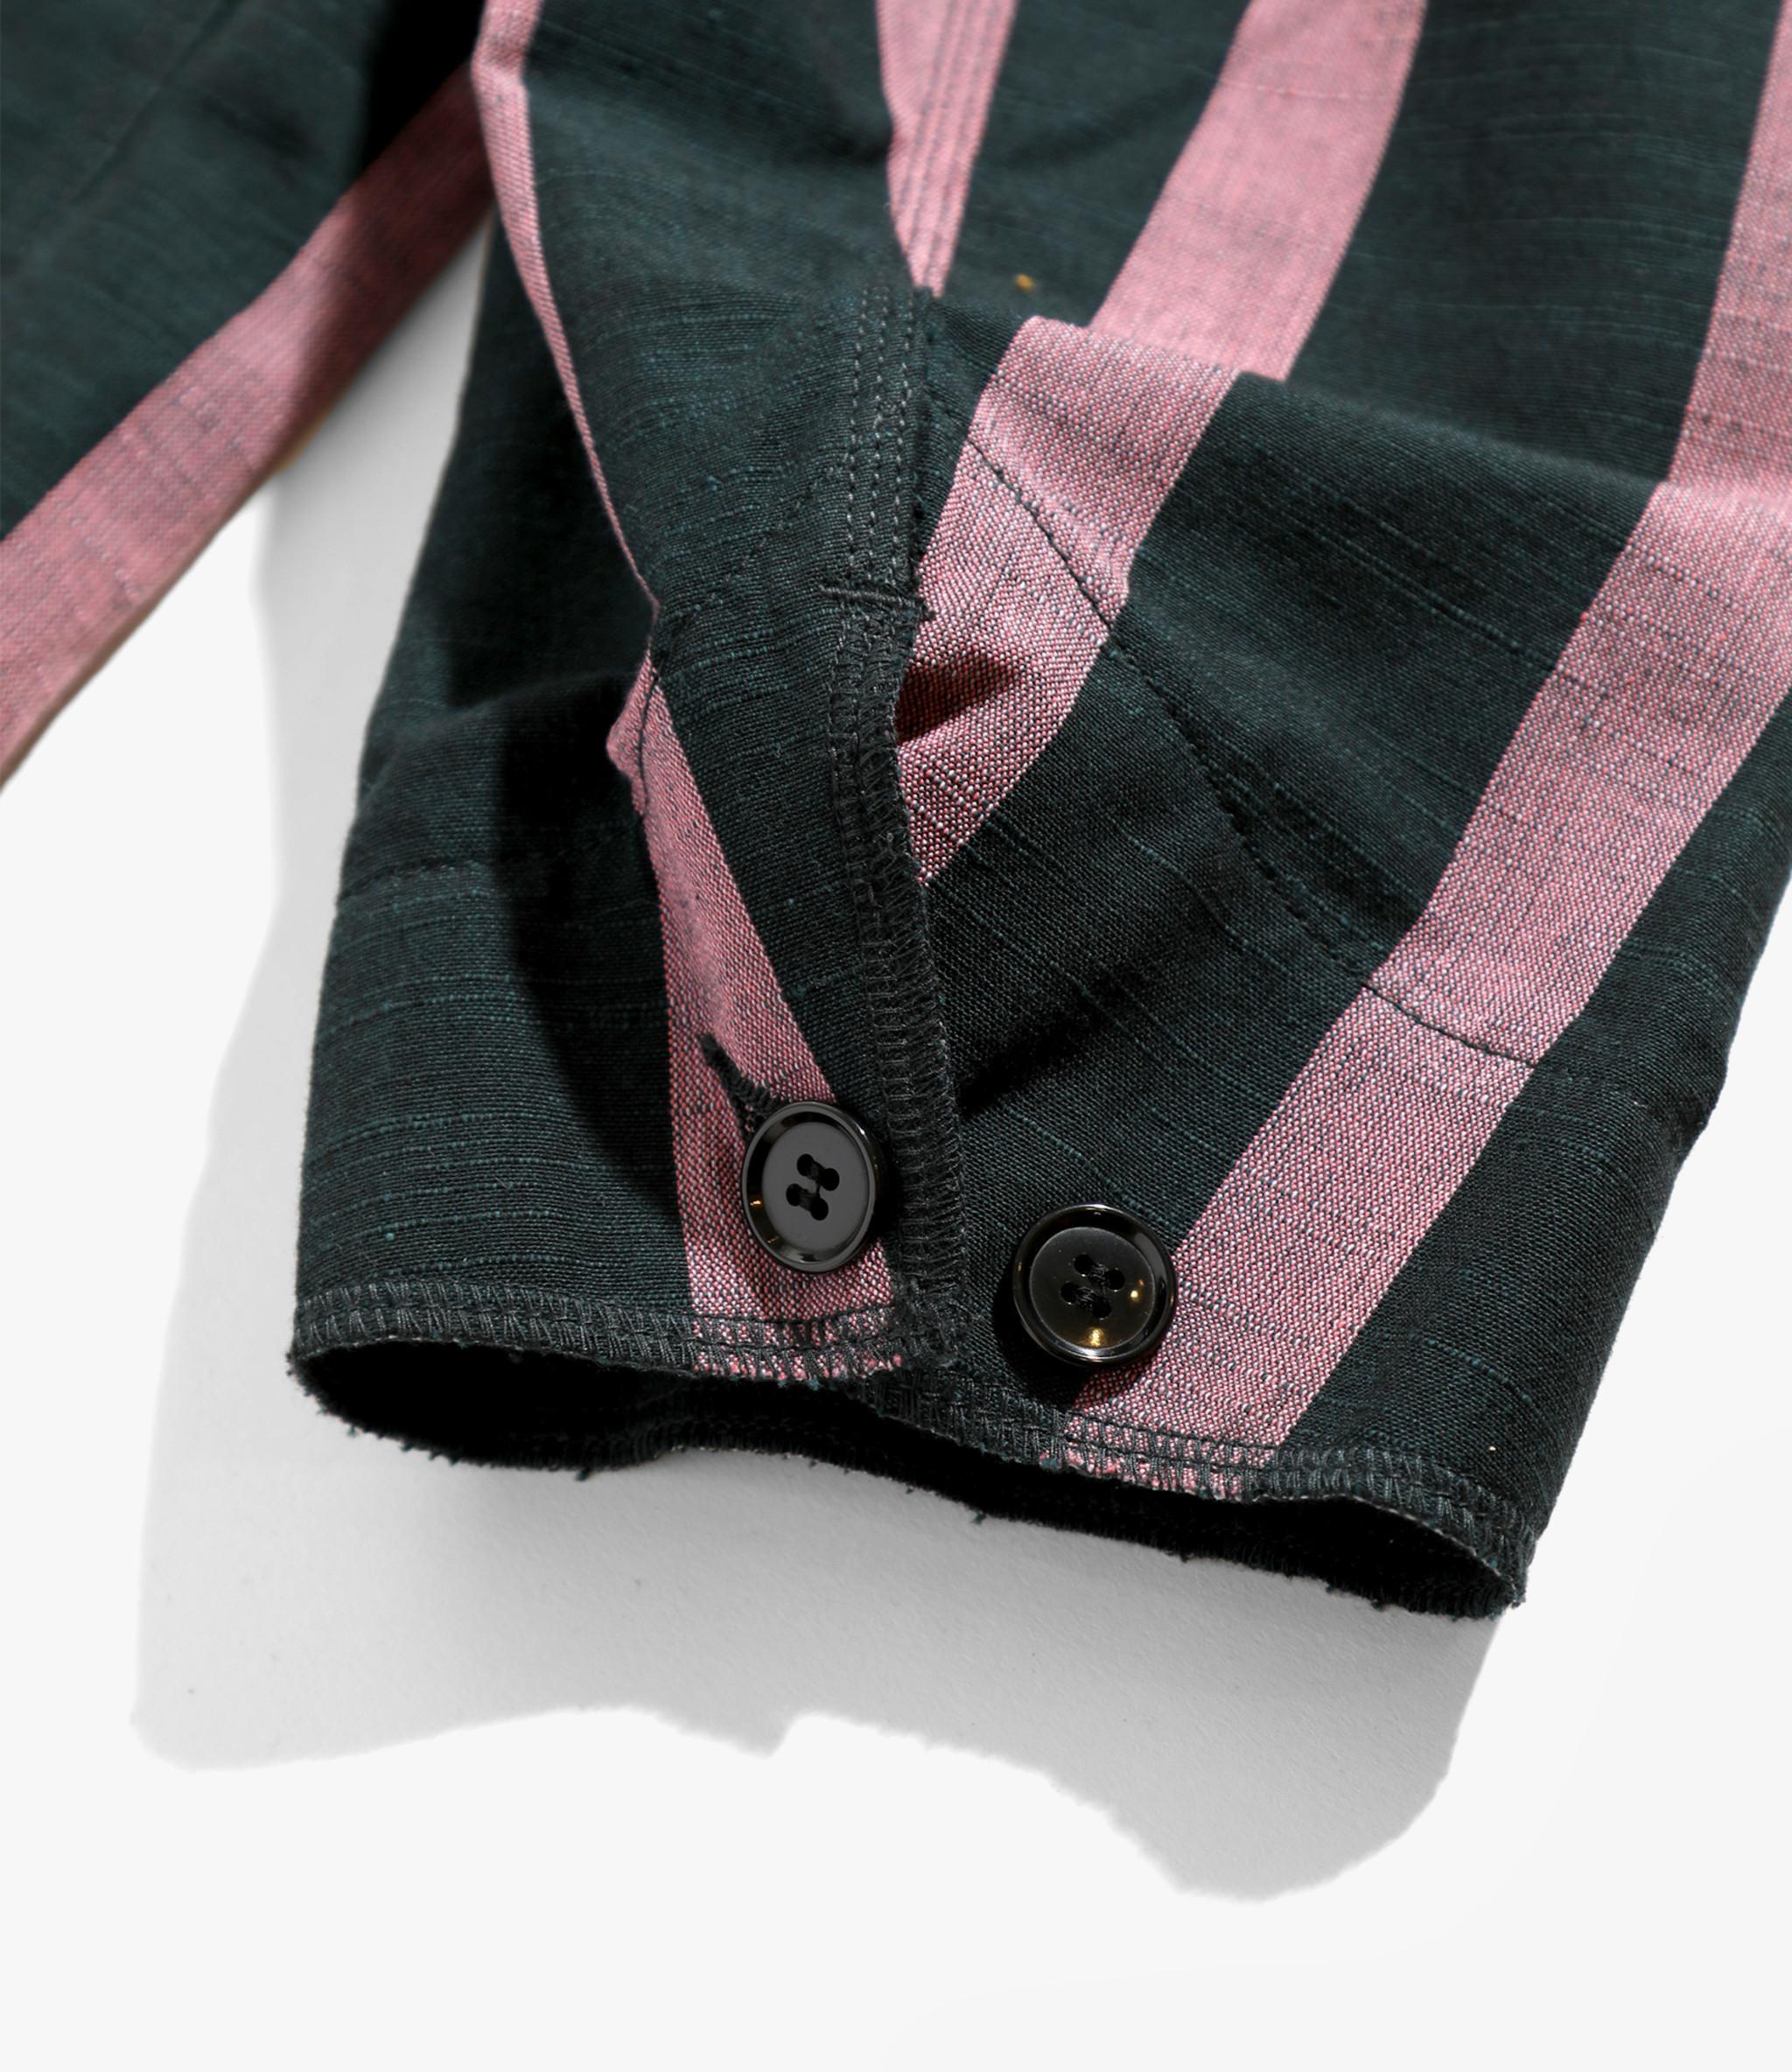 Needles Chore Coat - Aizu-Tsumugi - Dk.Green/Pink